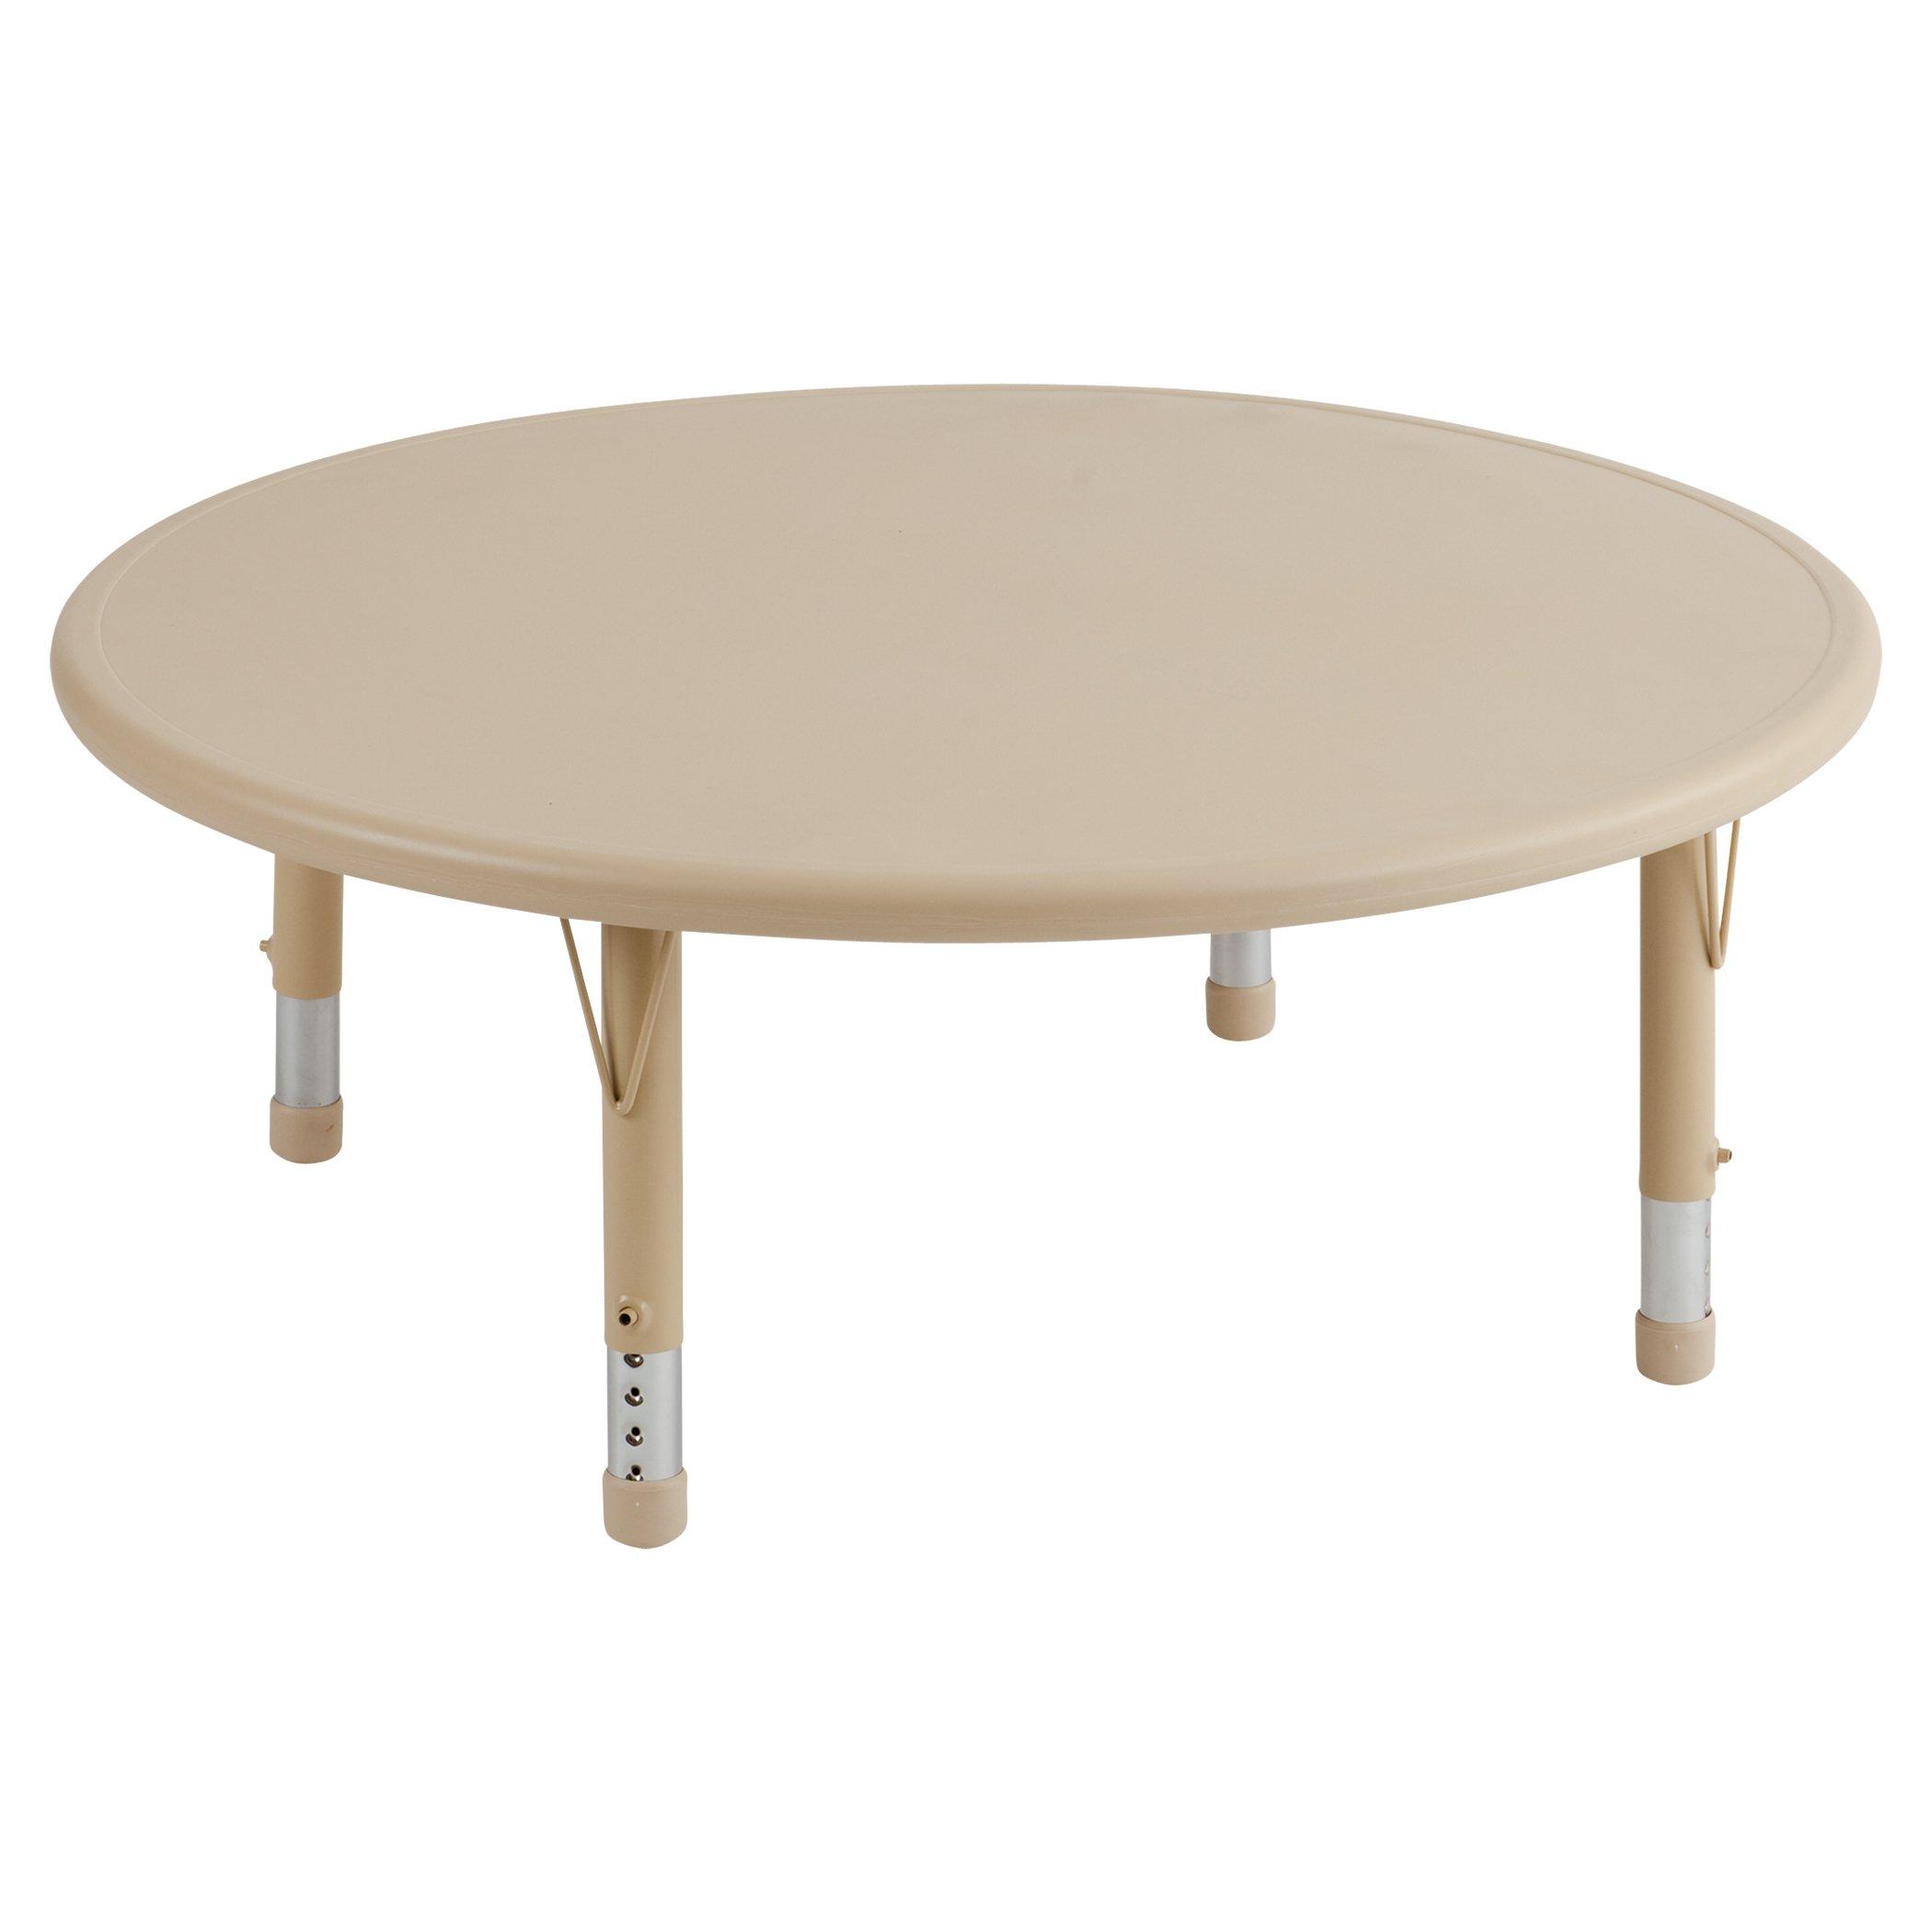 ECR4Kids 45'' Round Resin Activity Table, Sand